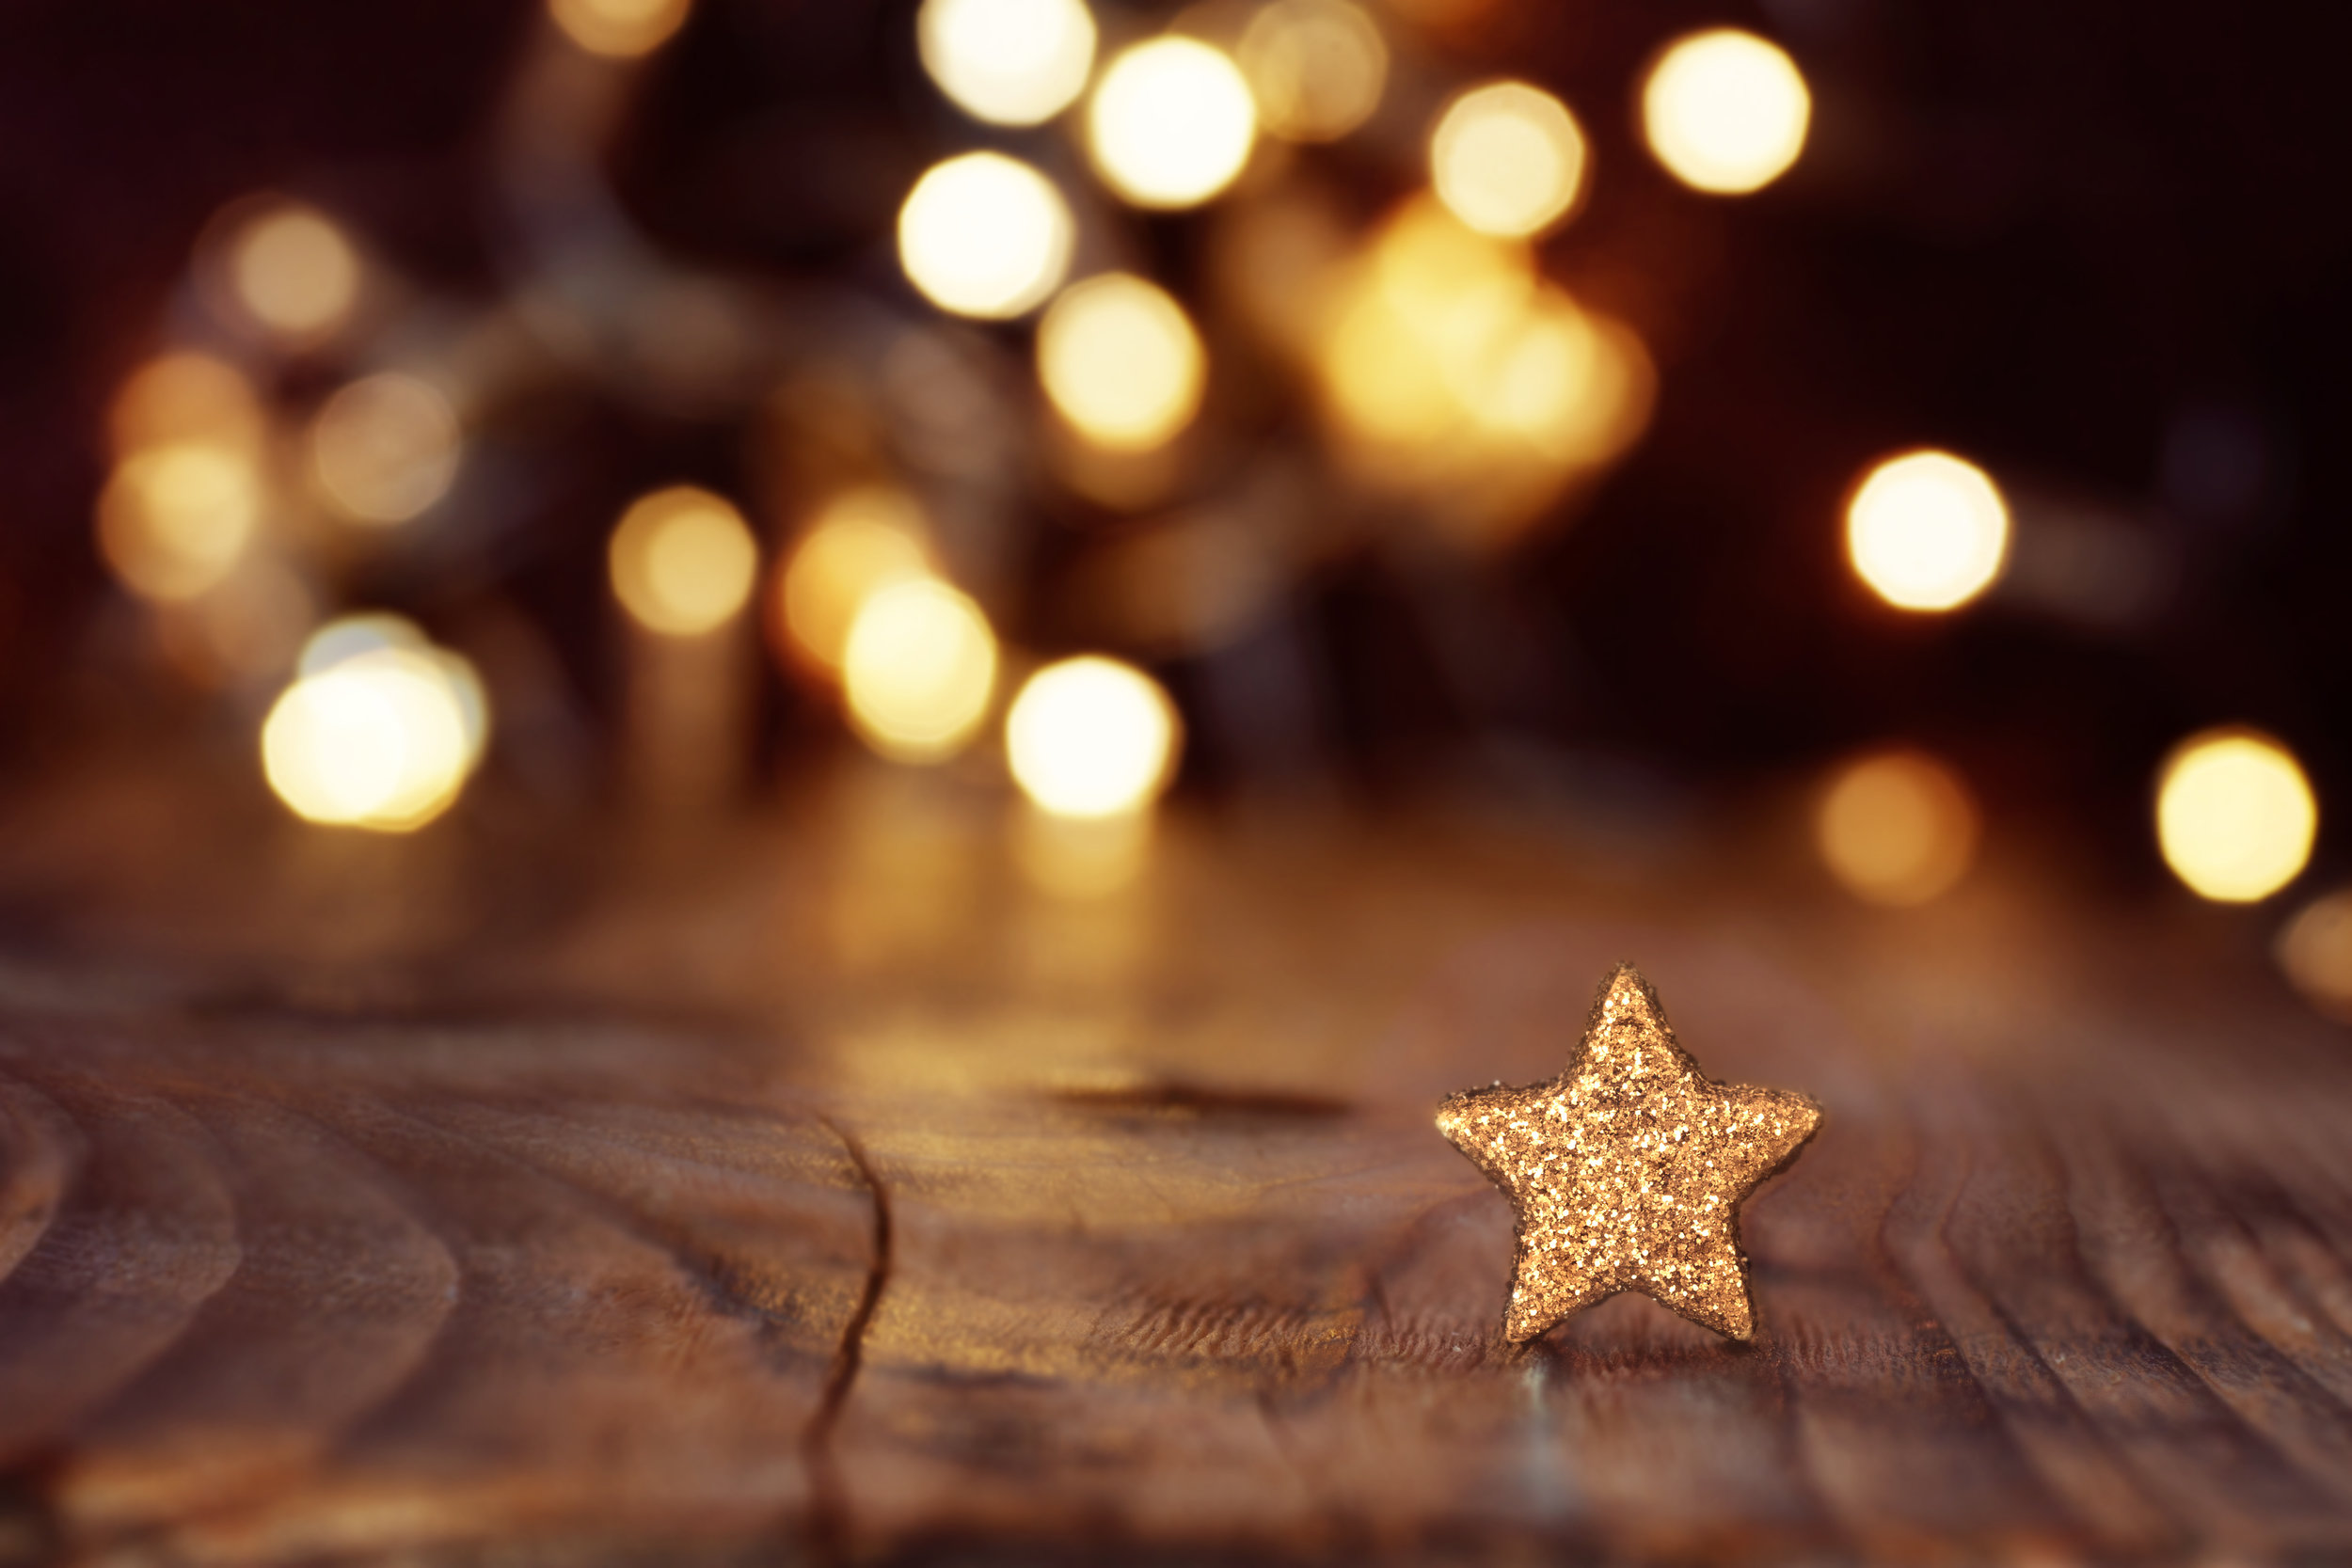 Christmas-background-with-stars-and-bokeh-607461520_4272x2848.jpeg